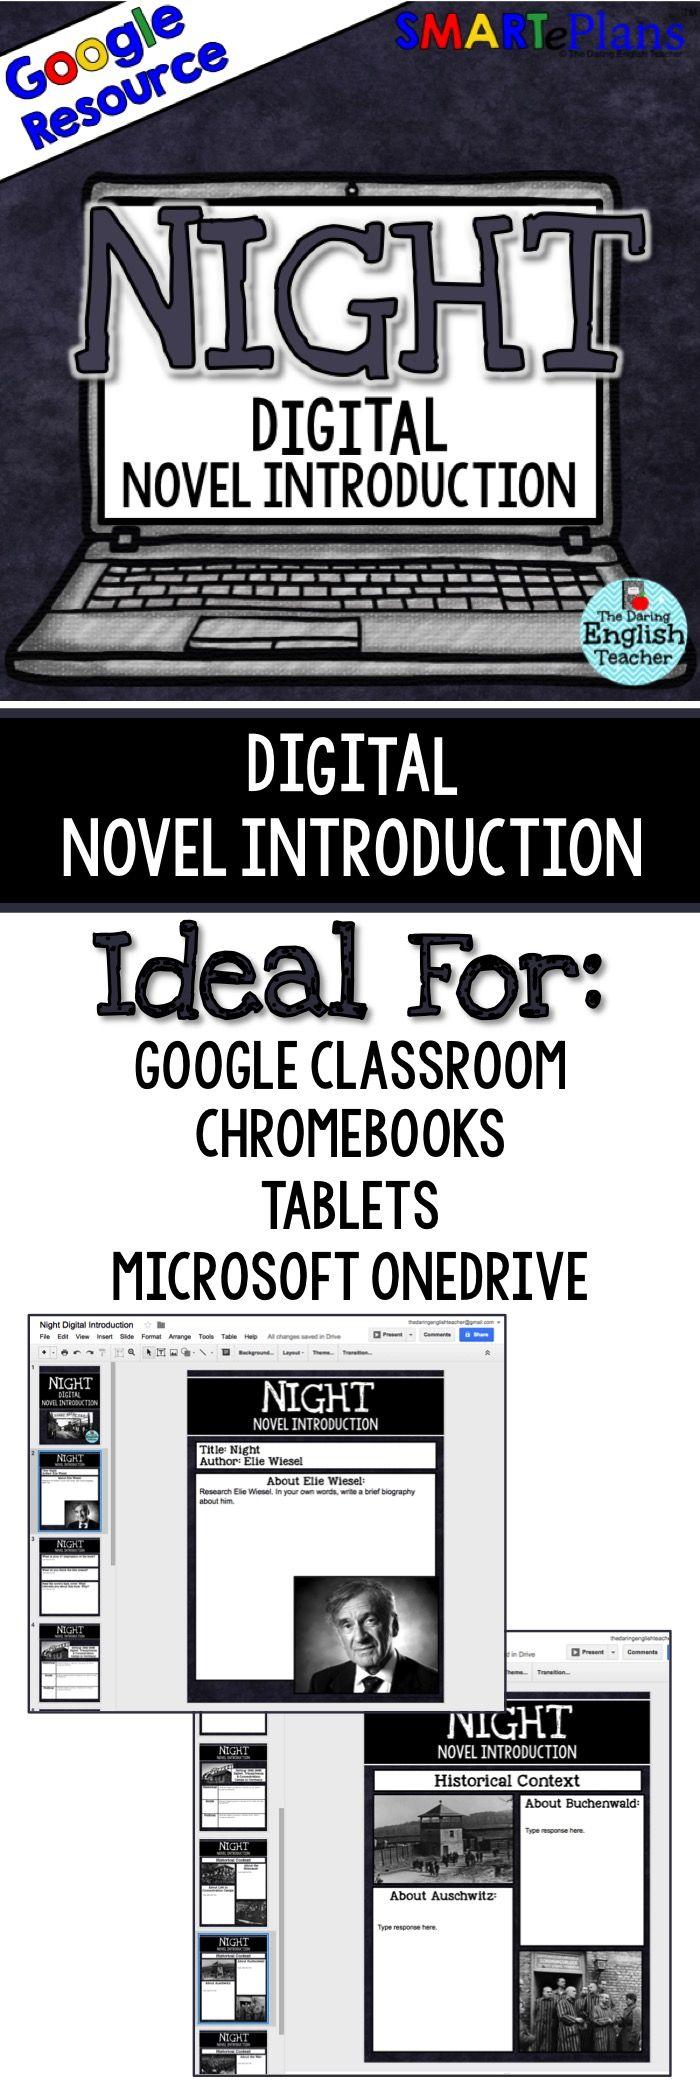 Digital Night Introduction. Elie Wisel. SMARTePlans. Google Classroom. Google Drive.